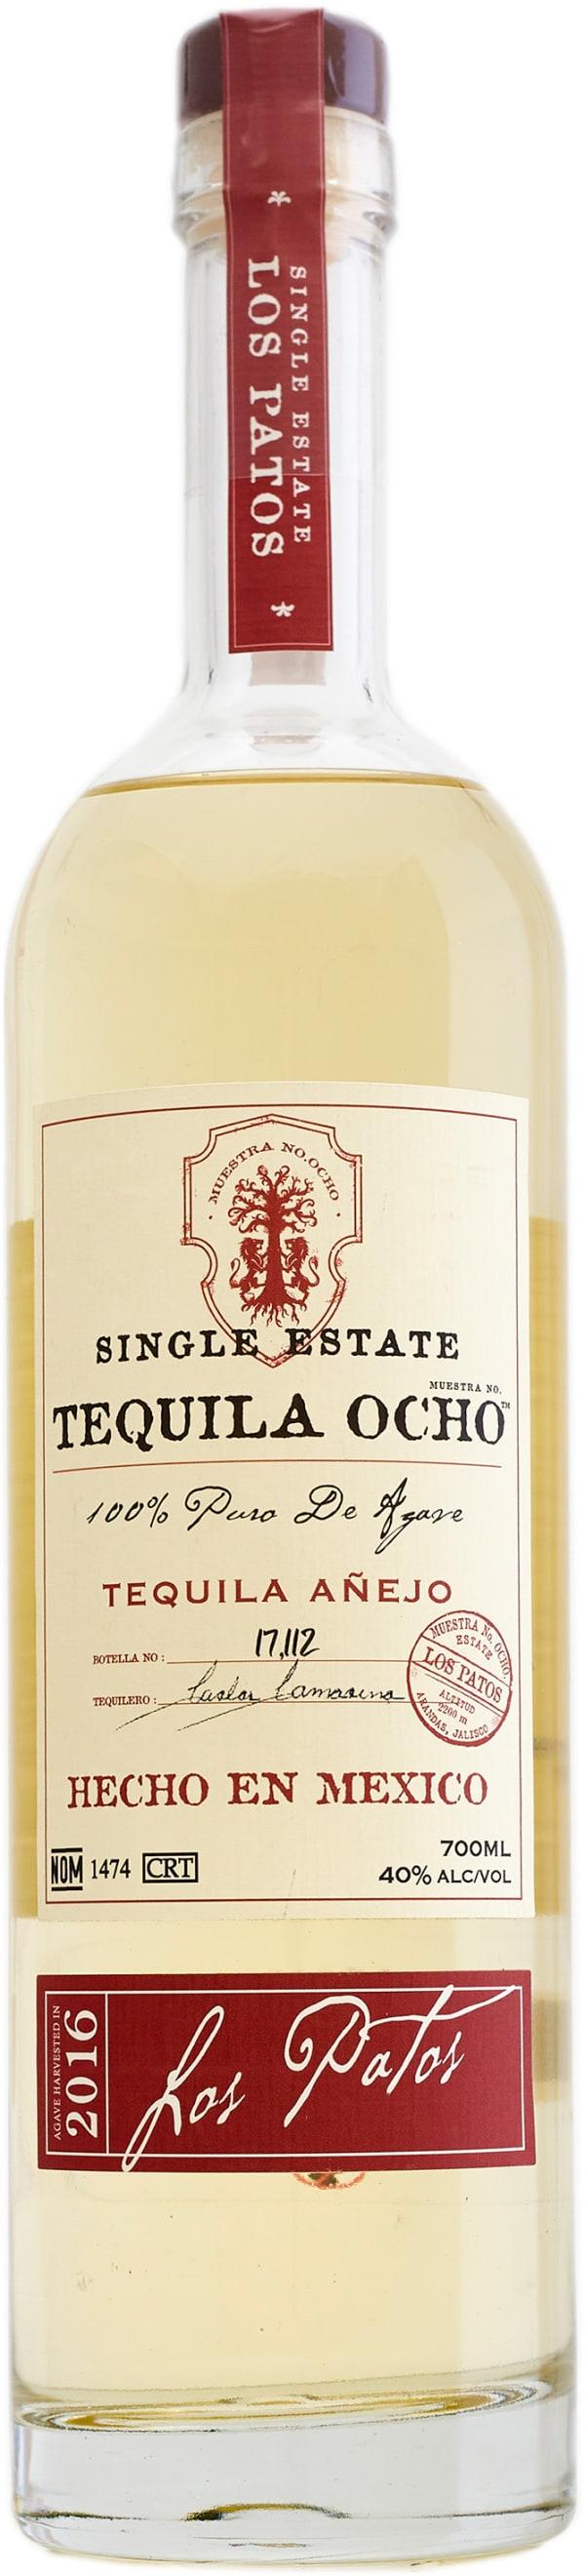 Ocho Añejo Las Aguilas Tequila 2017